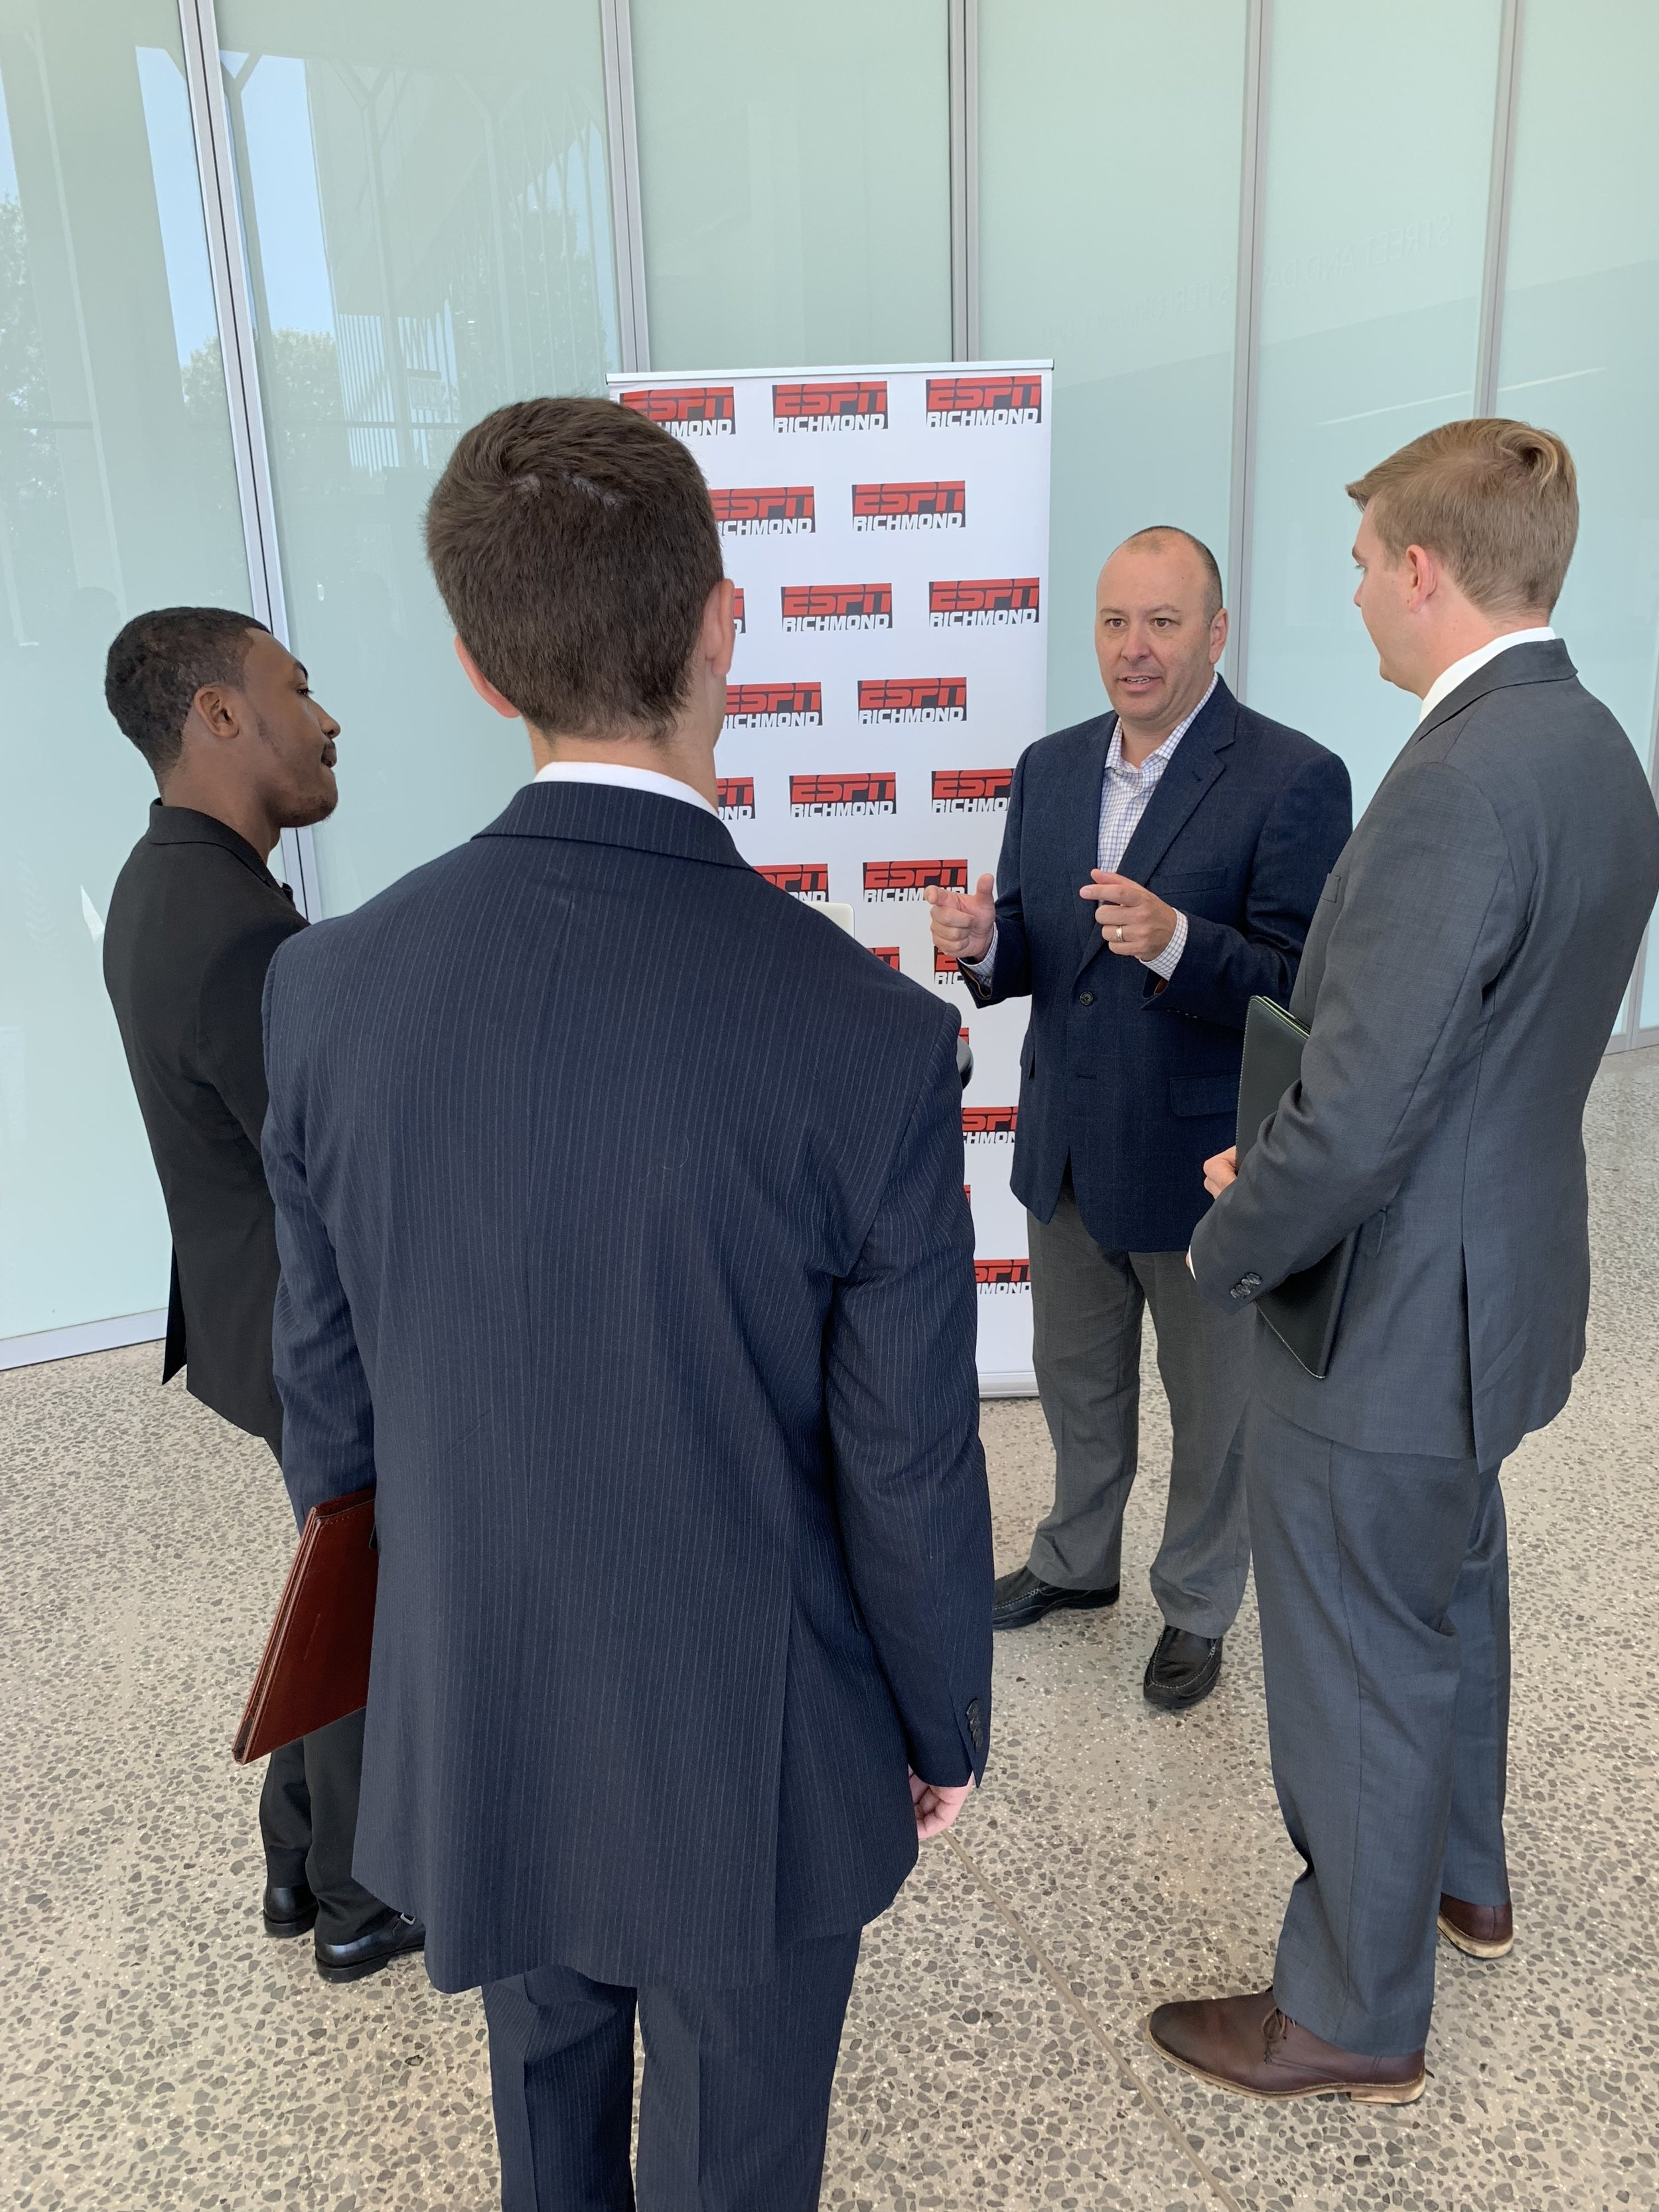 Greg Burton of ESPN Radio in Richmond, Virginia visits with Virginia Tech students at the Virginia Tech Communication Department 2018 Career Fair.